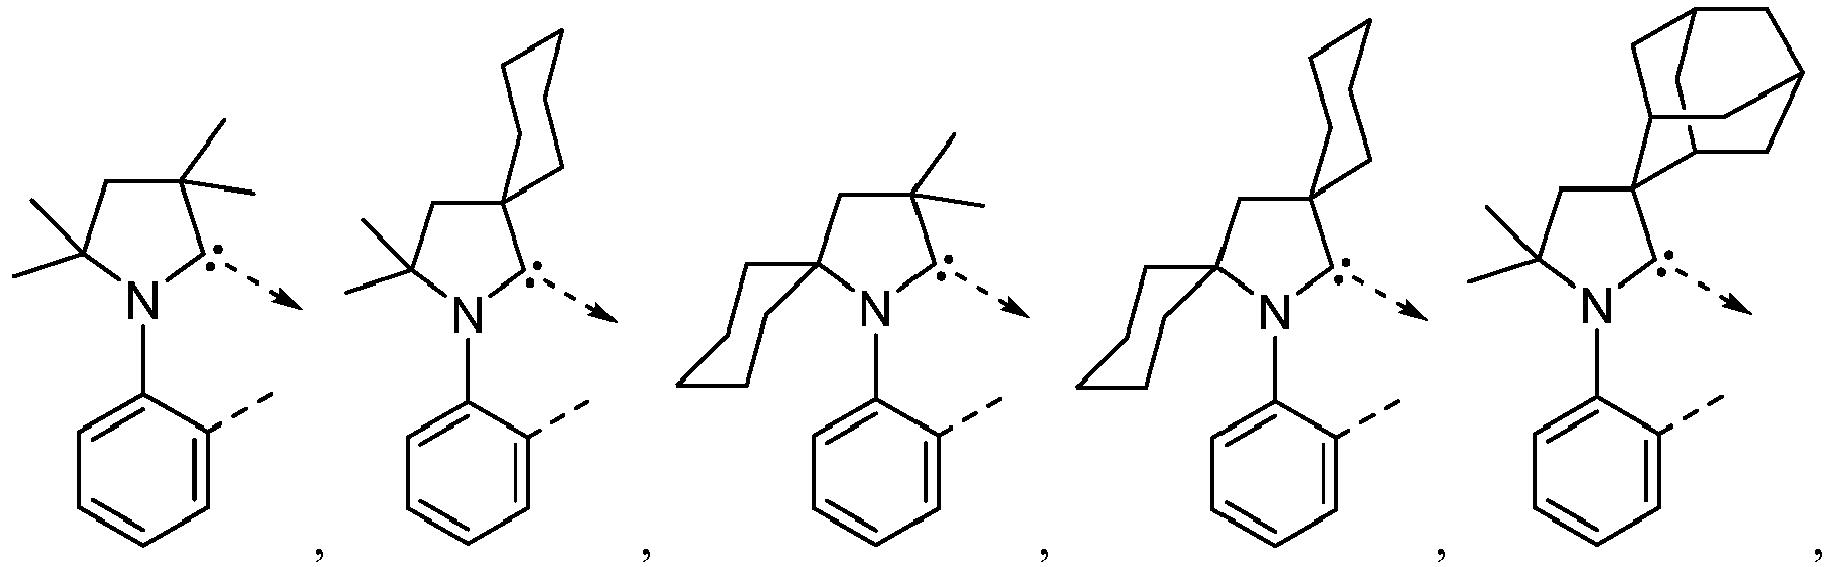 Figure imgb0968